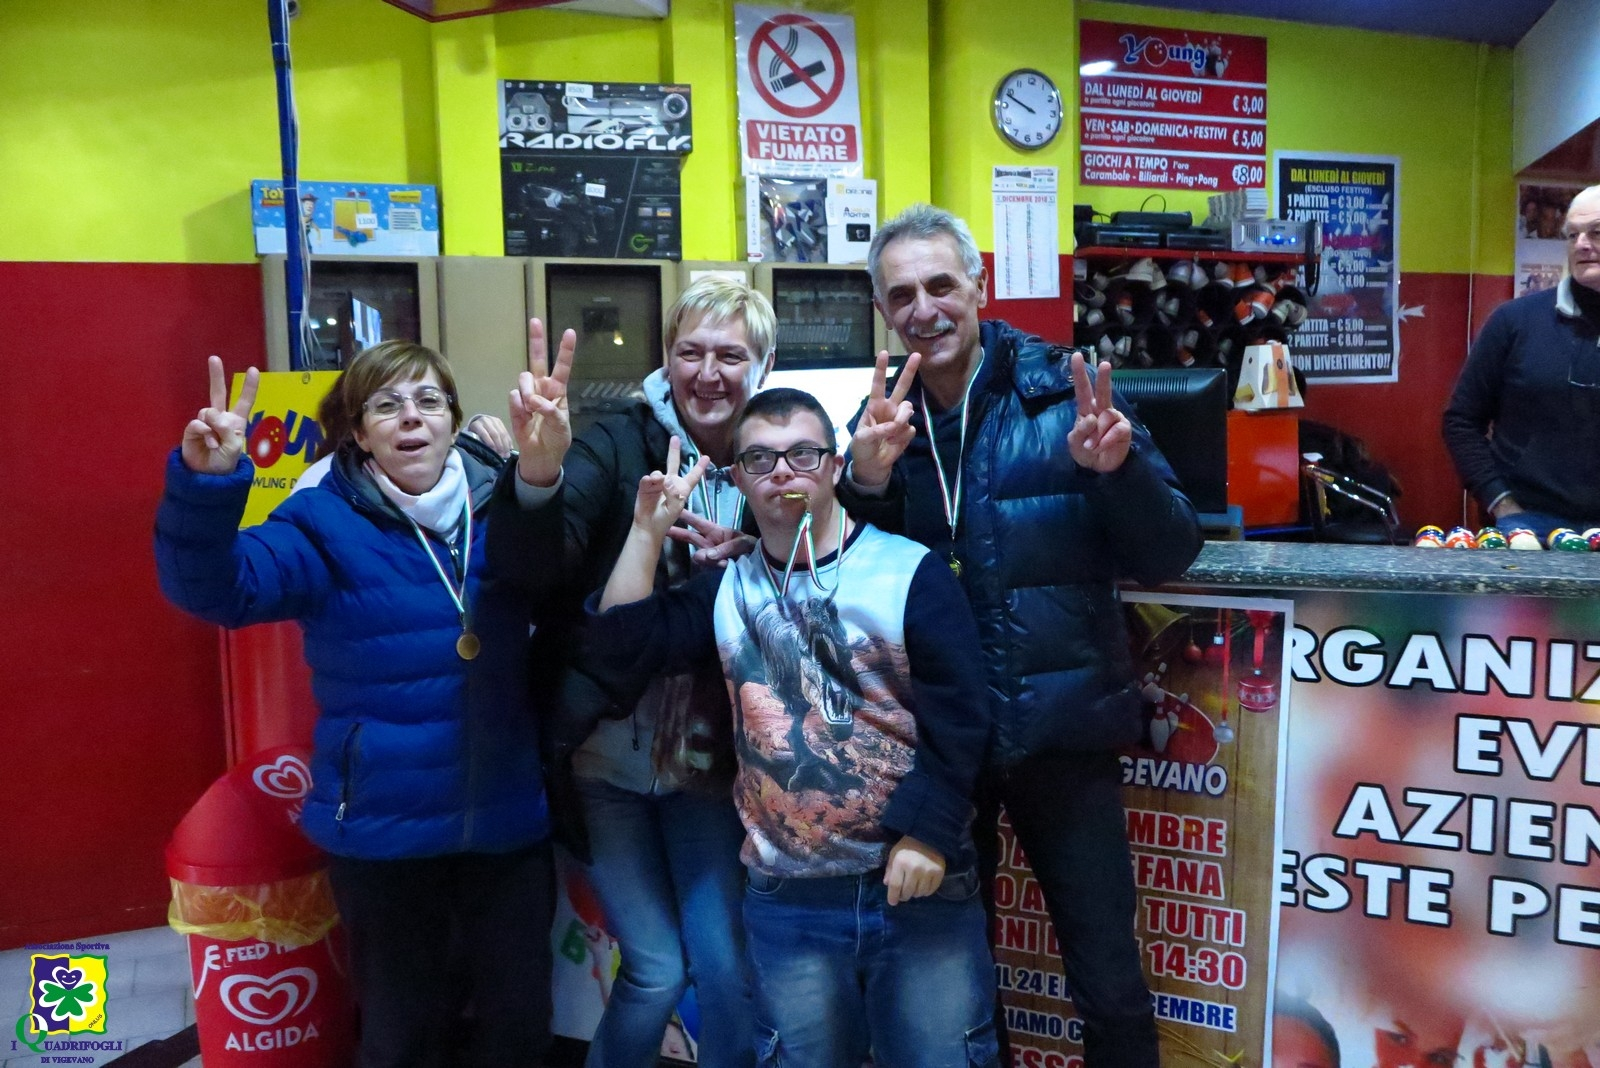 Torneo Bowling Vigevano 19-12-2018 - 089